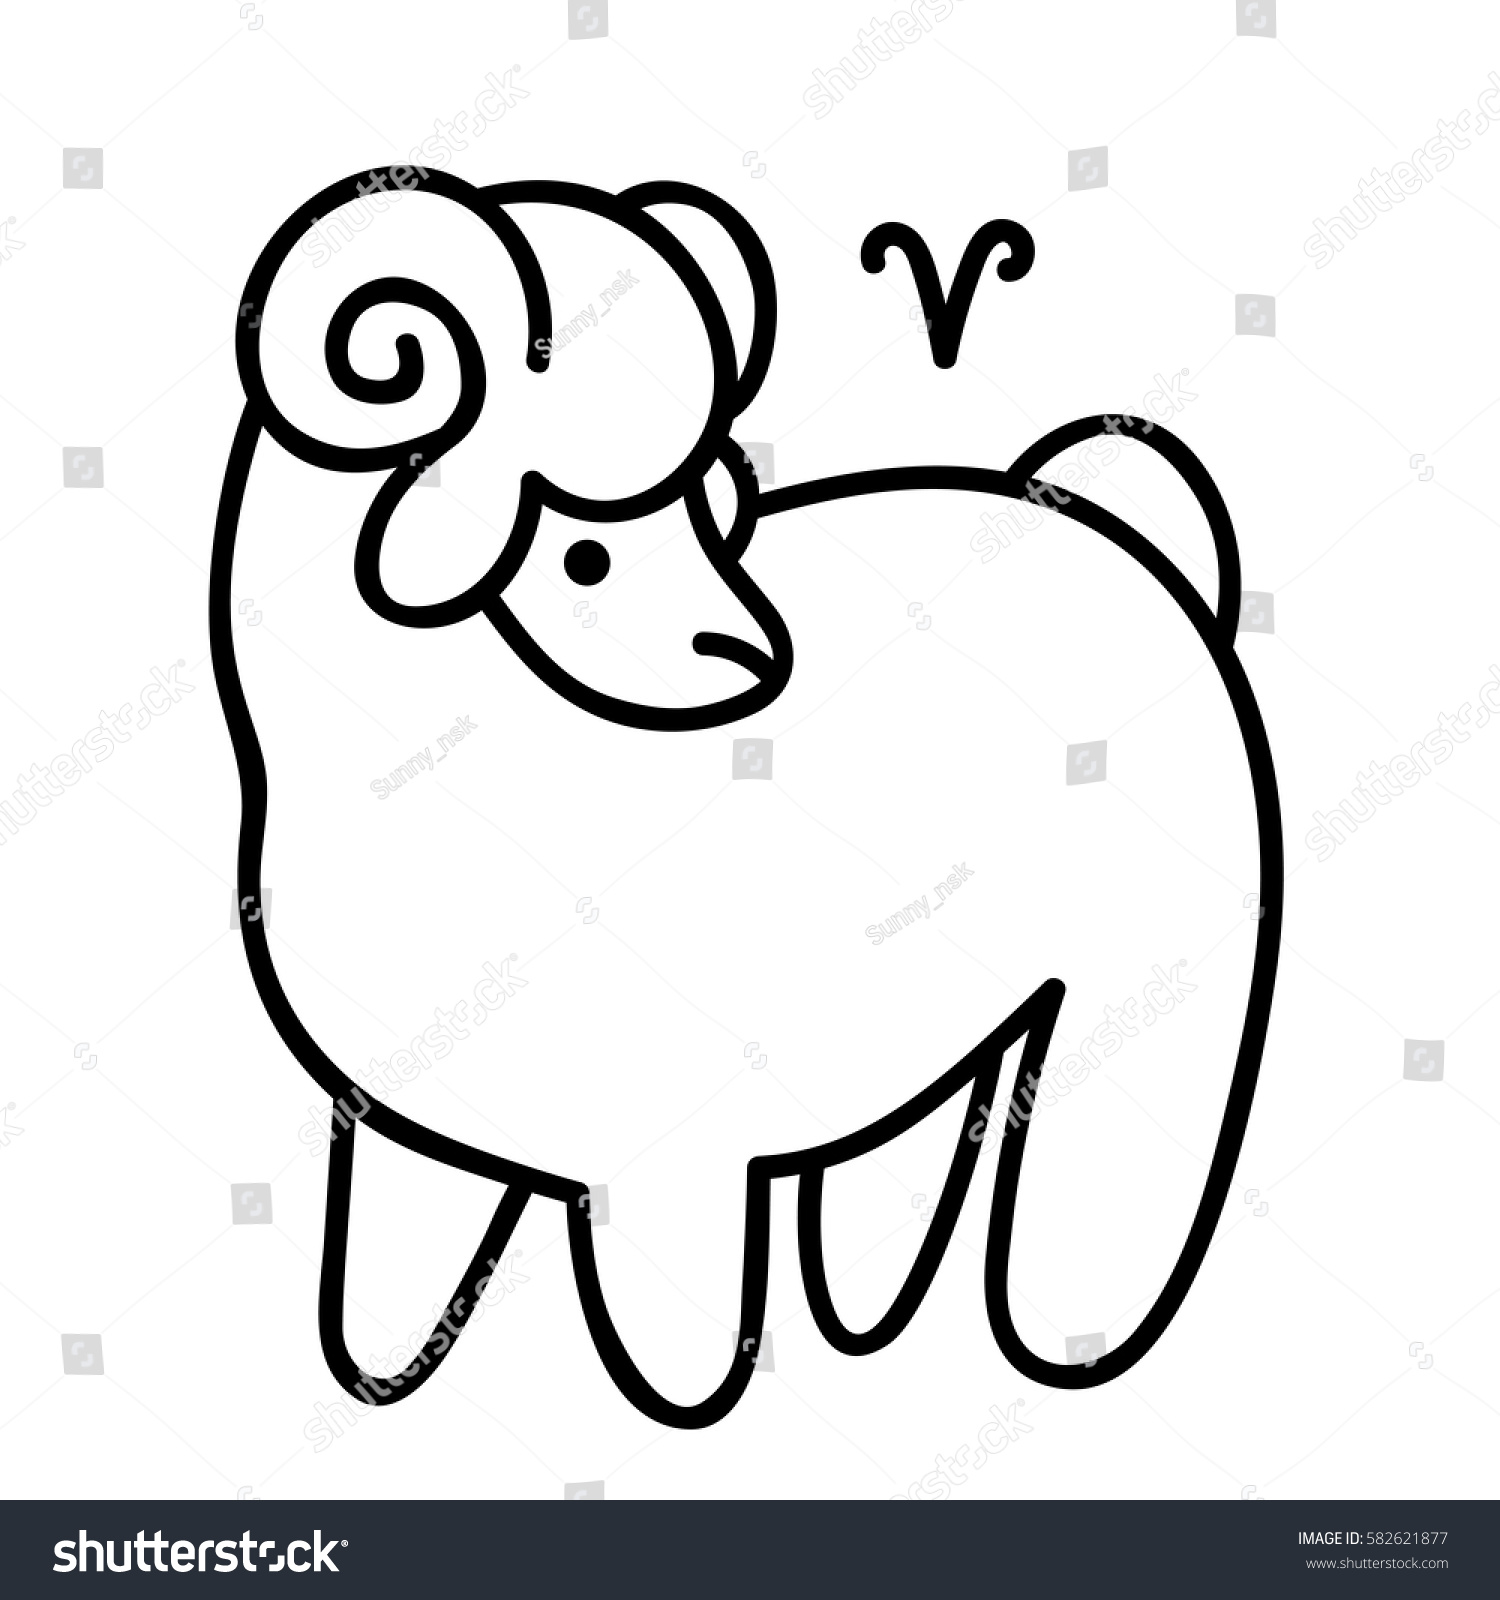 Vector Line Art Aries Zodiac Symbol Stock Vector 2018 582621877